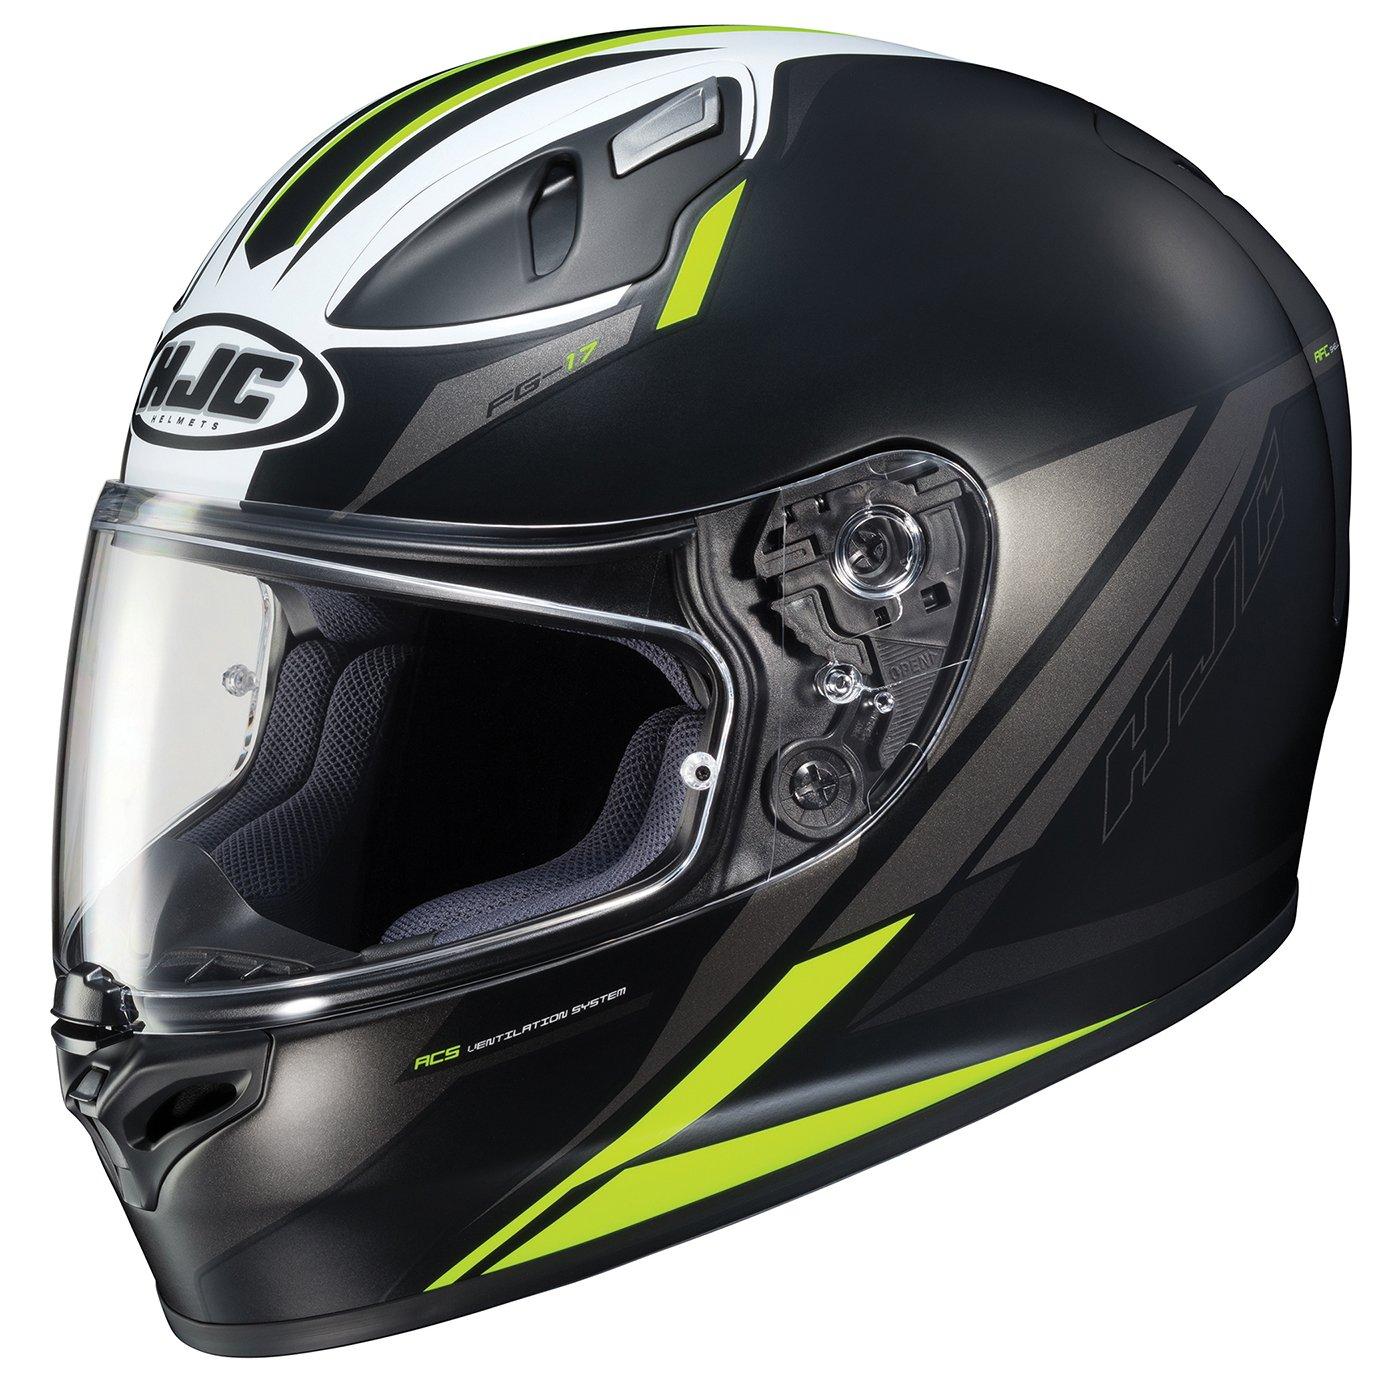 HJC Helmets Unisex-Adult Full-Face-Helmet-Style FG-17 Valve Helmet 638-731 MC-3HSF Black//Hi-Vis, X-Small